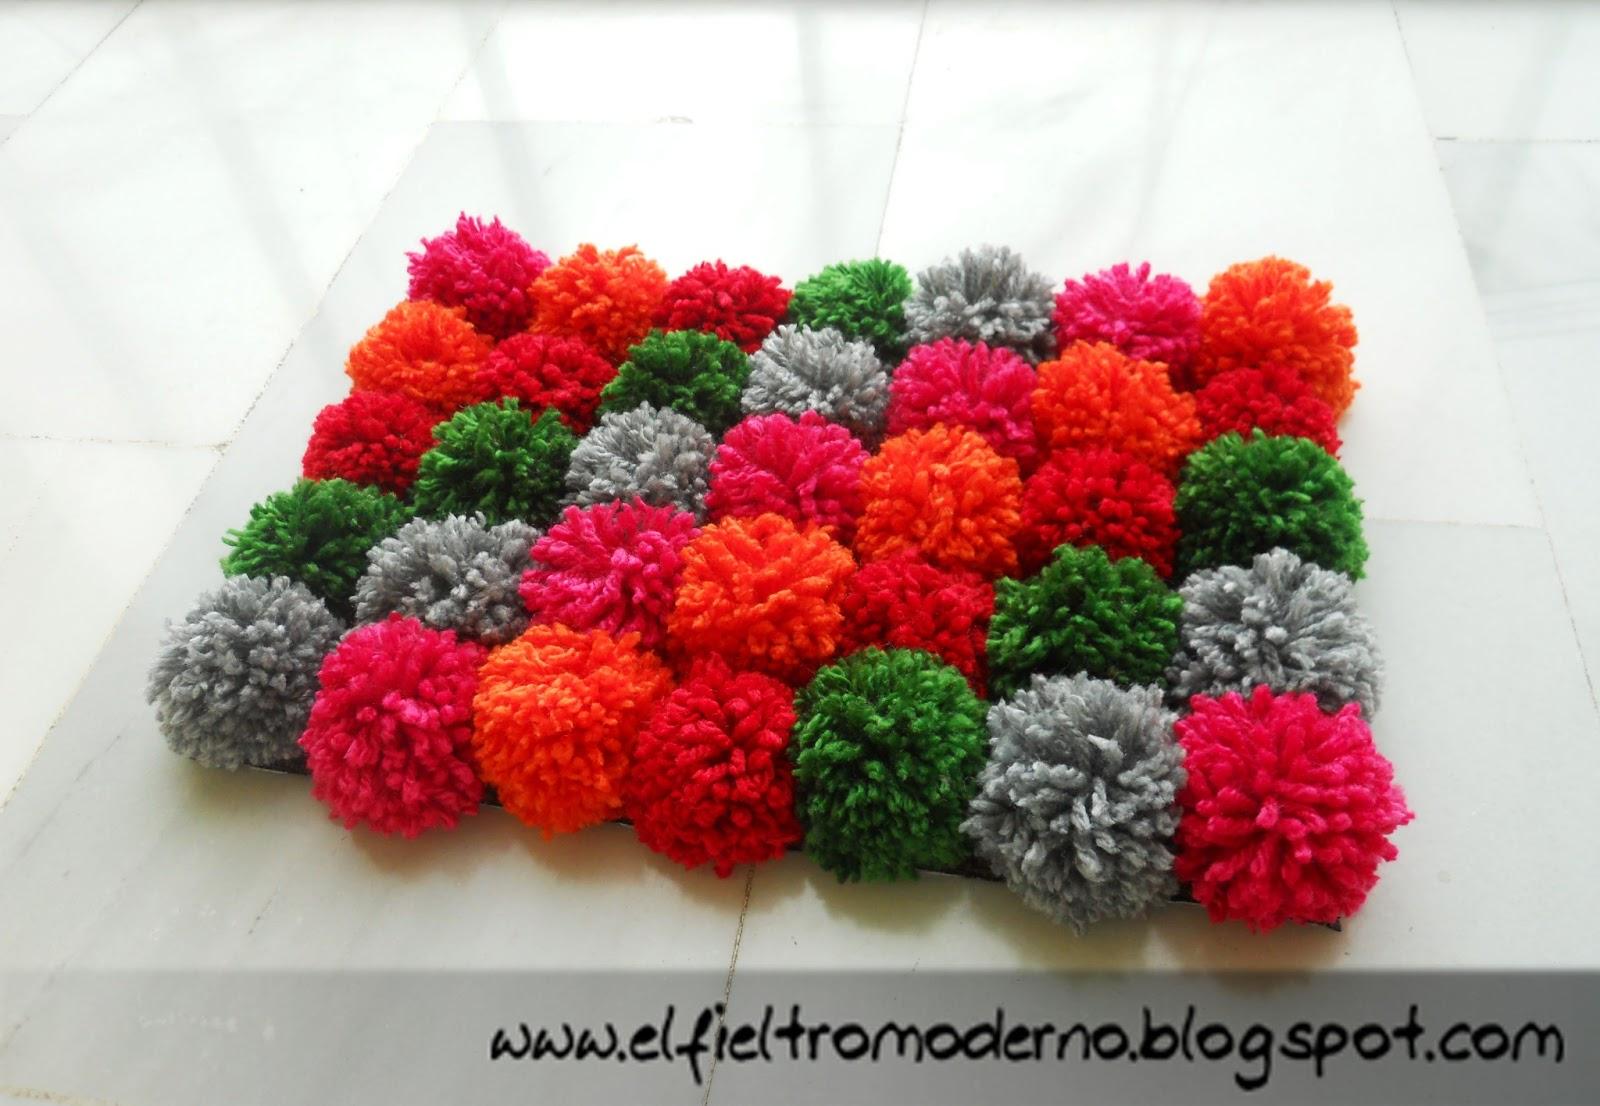 El fieltro moderno manualidades con lana cratfs with wool - Manualidades en lana ...